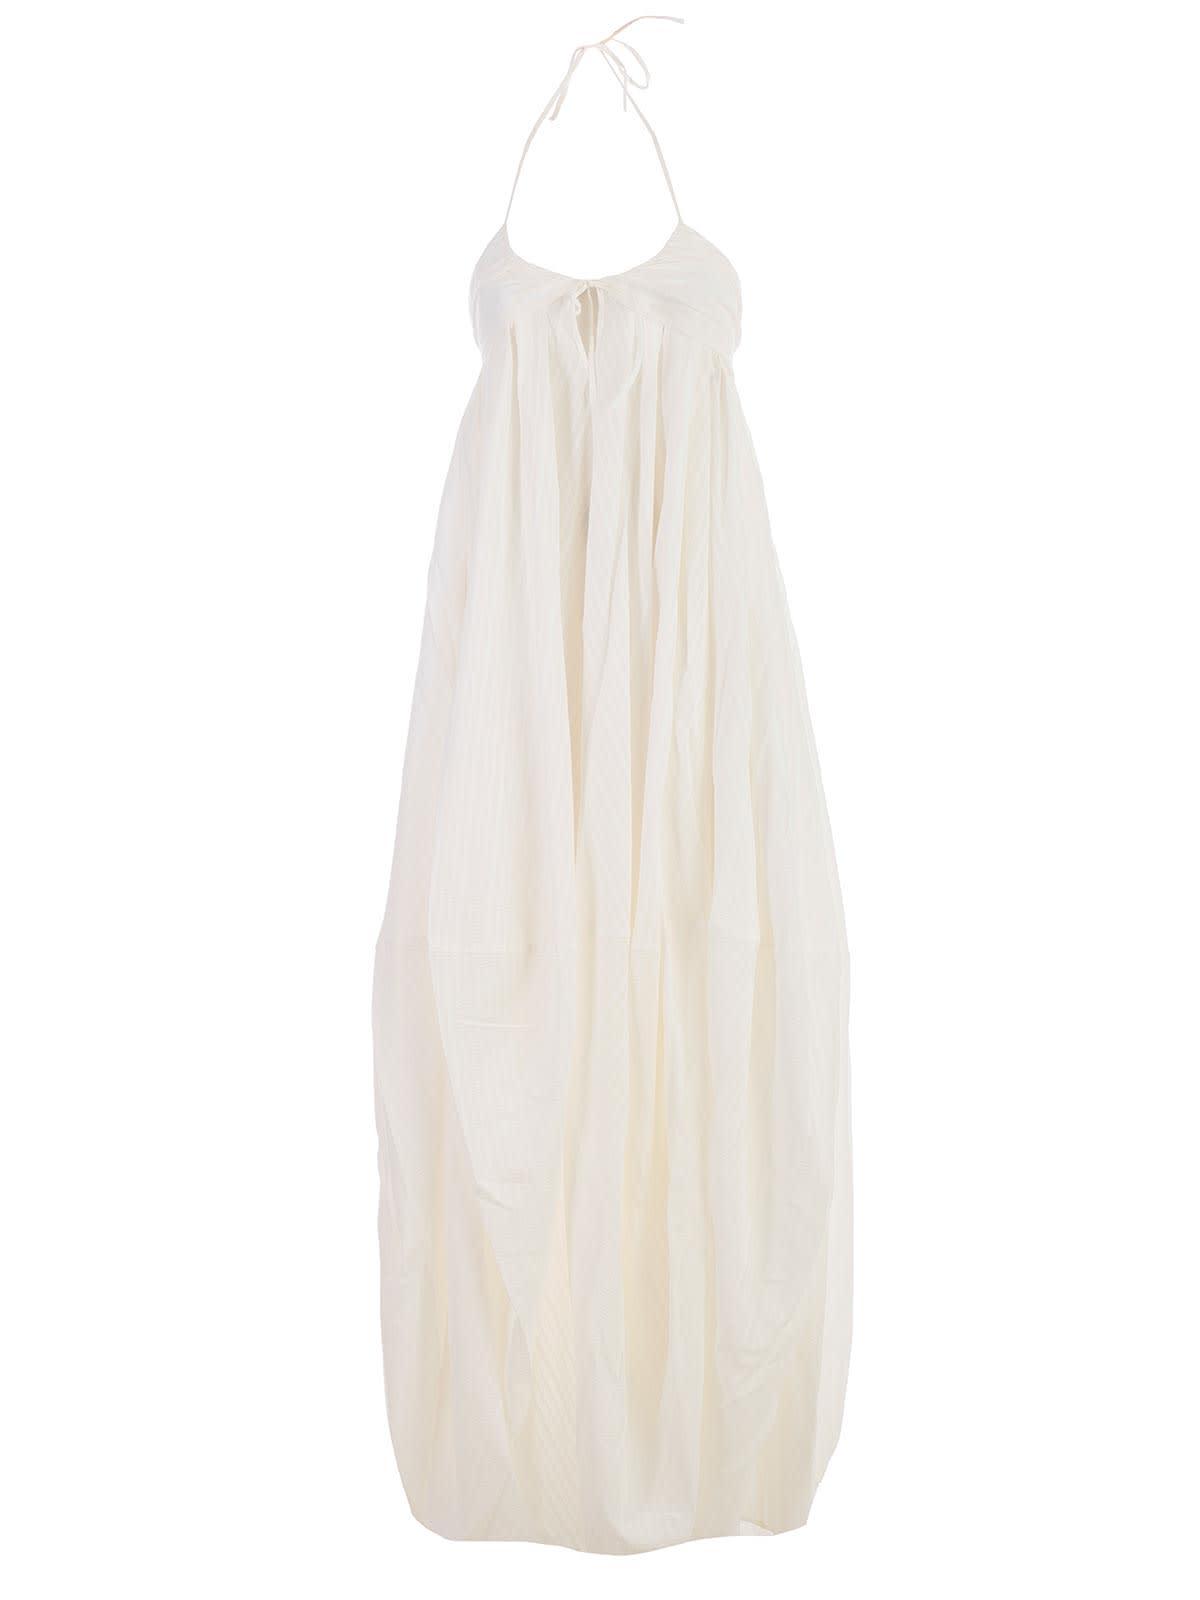 Jacquemus Oversized Calci Dress